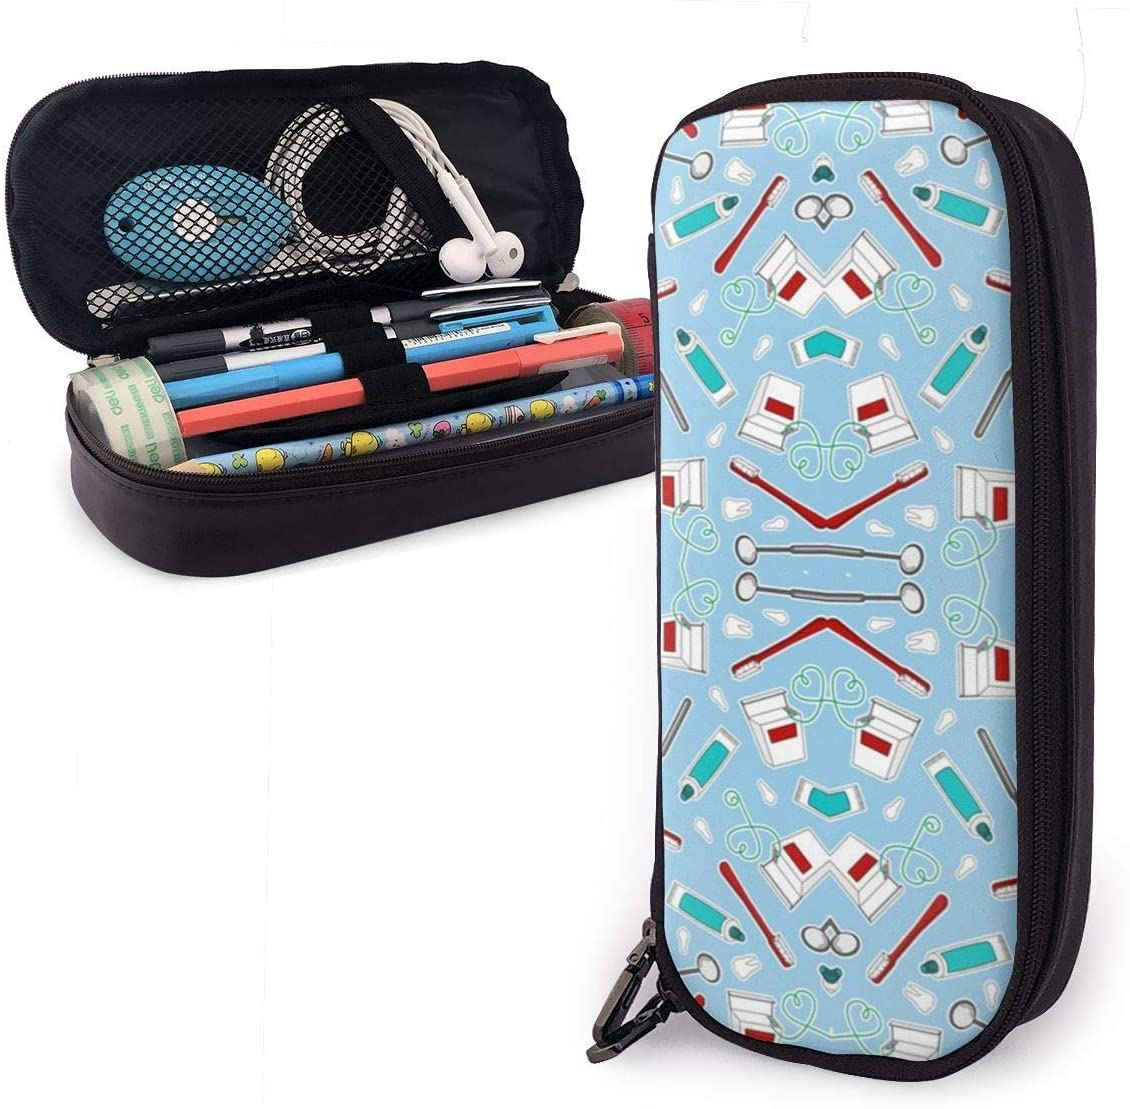 Cuero de PU impermeable de alto grado Dentista lindo Higienista dental Imprimir Estuche de lápices azul Estuche de lápices Escritorio